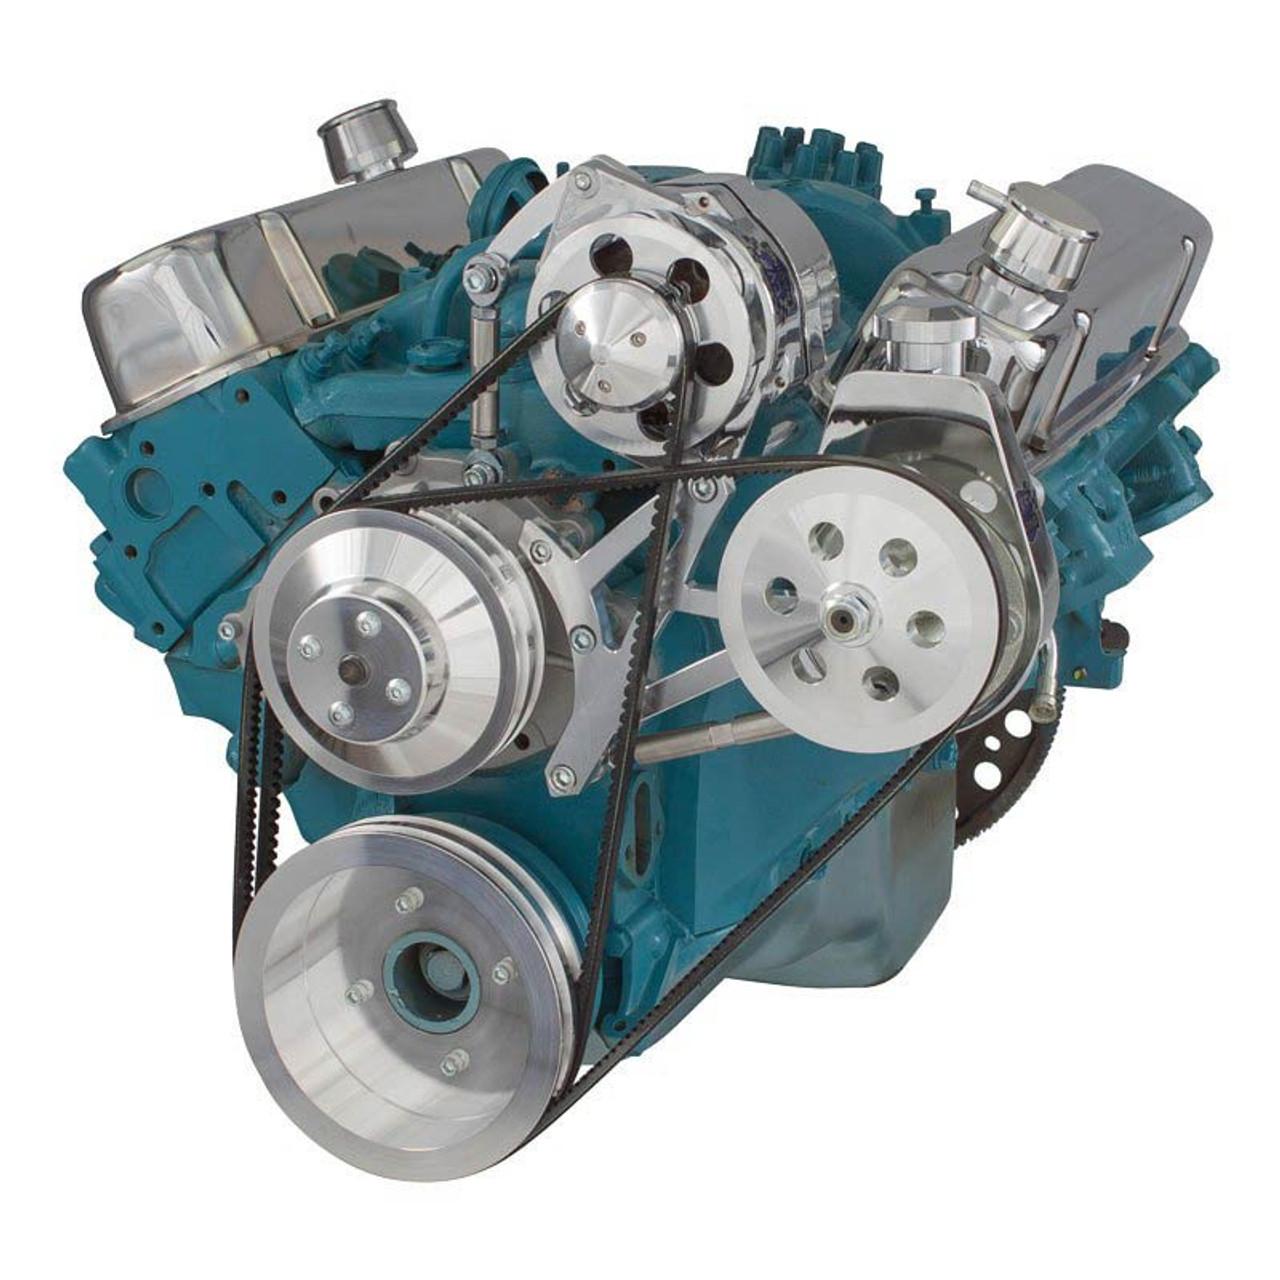 Pontiac VBelt Pulley System (350400, 428 & 455)